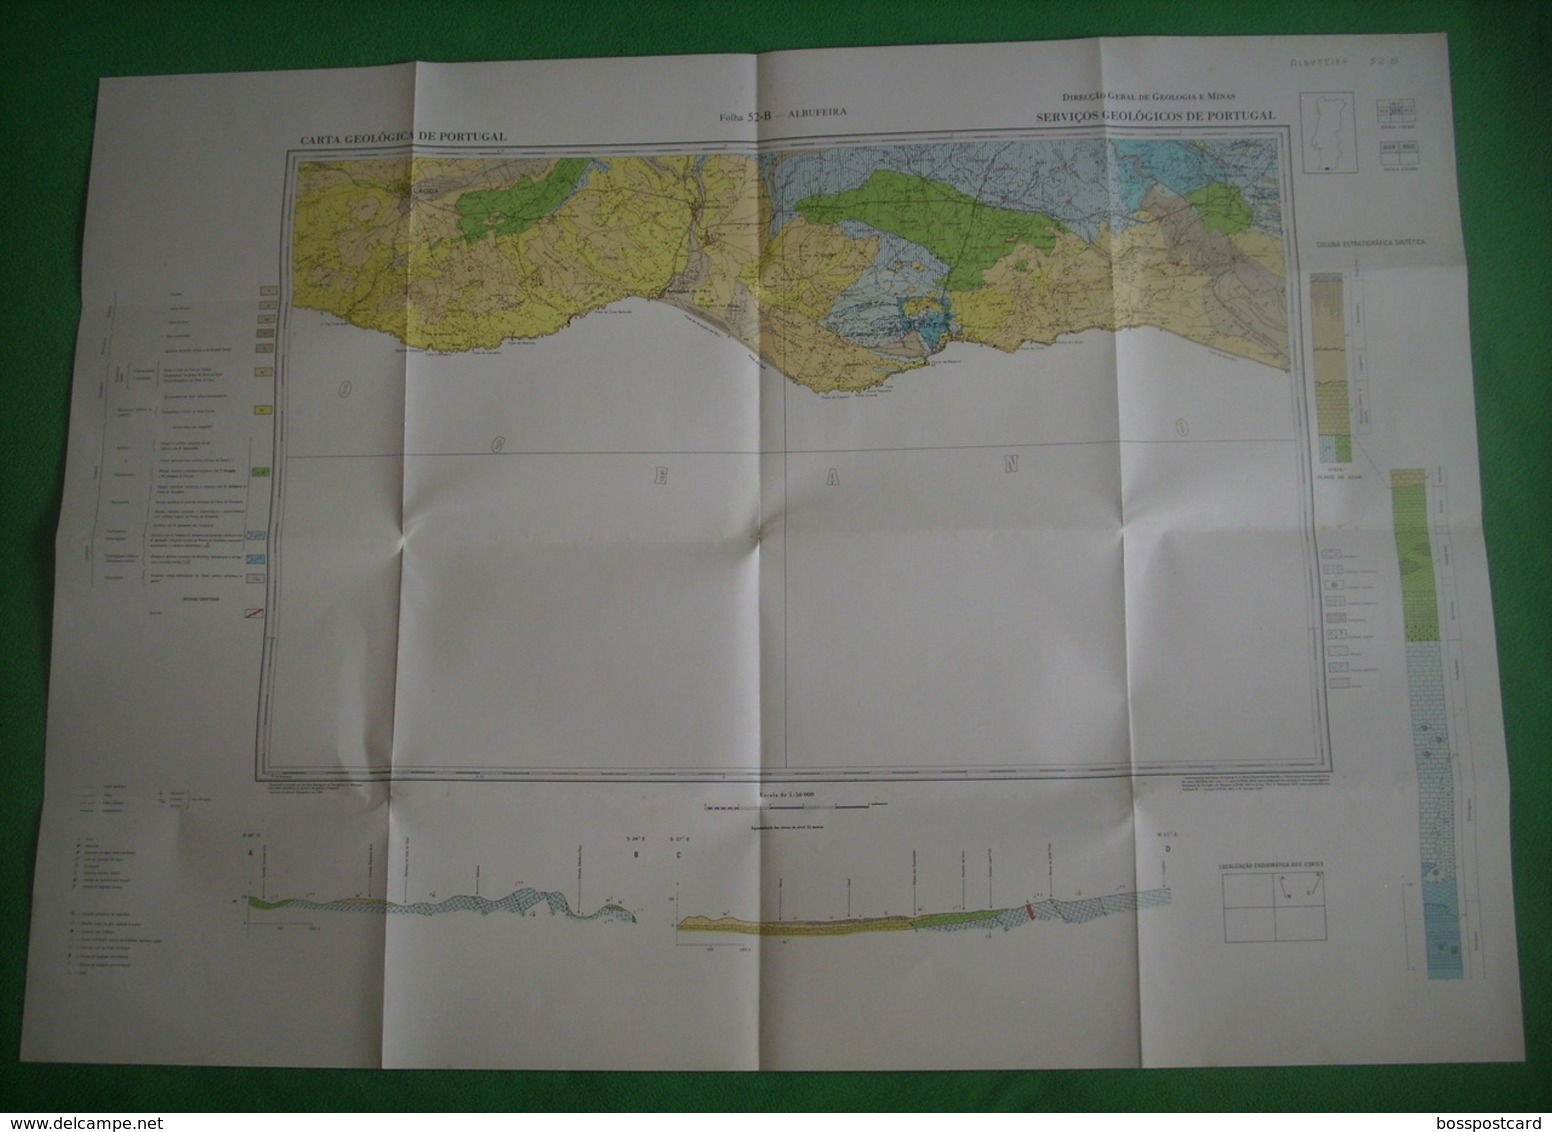 Albufeira - Mapa. Faro. - Geographical Maps